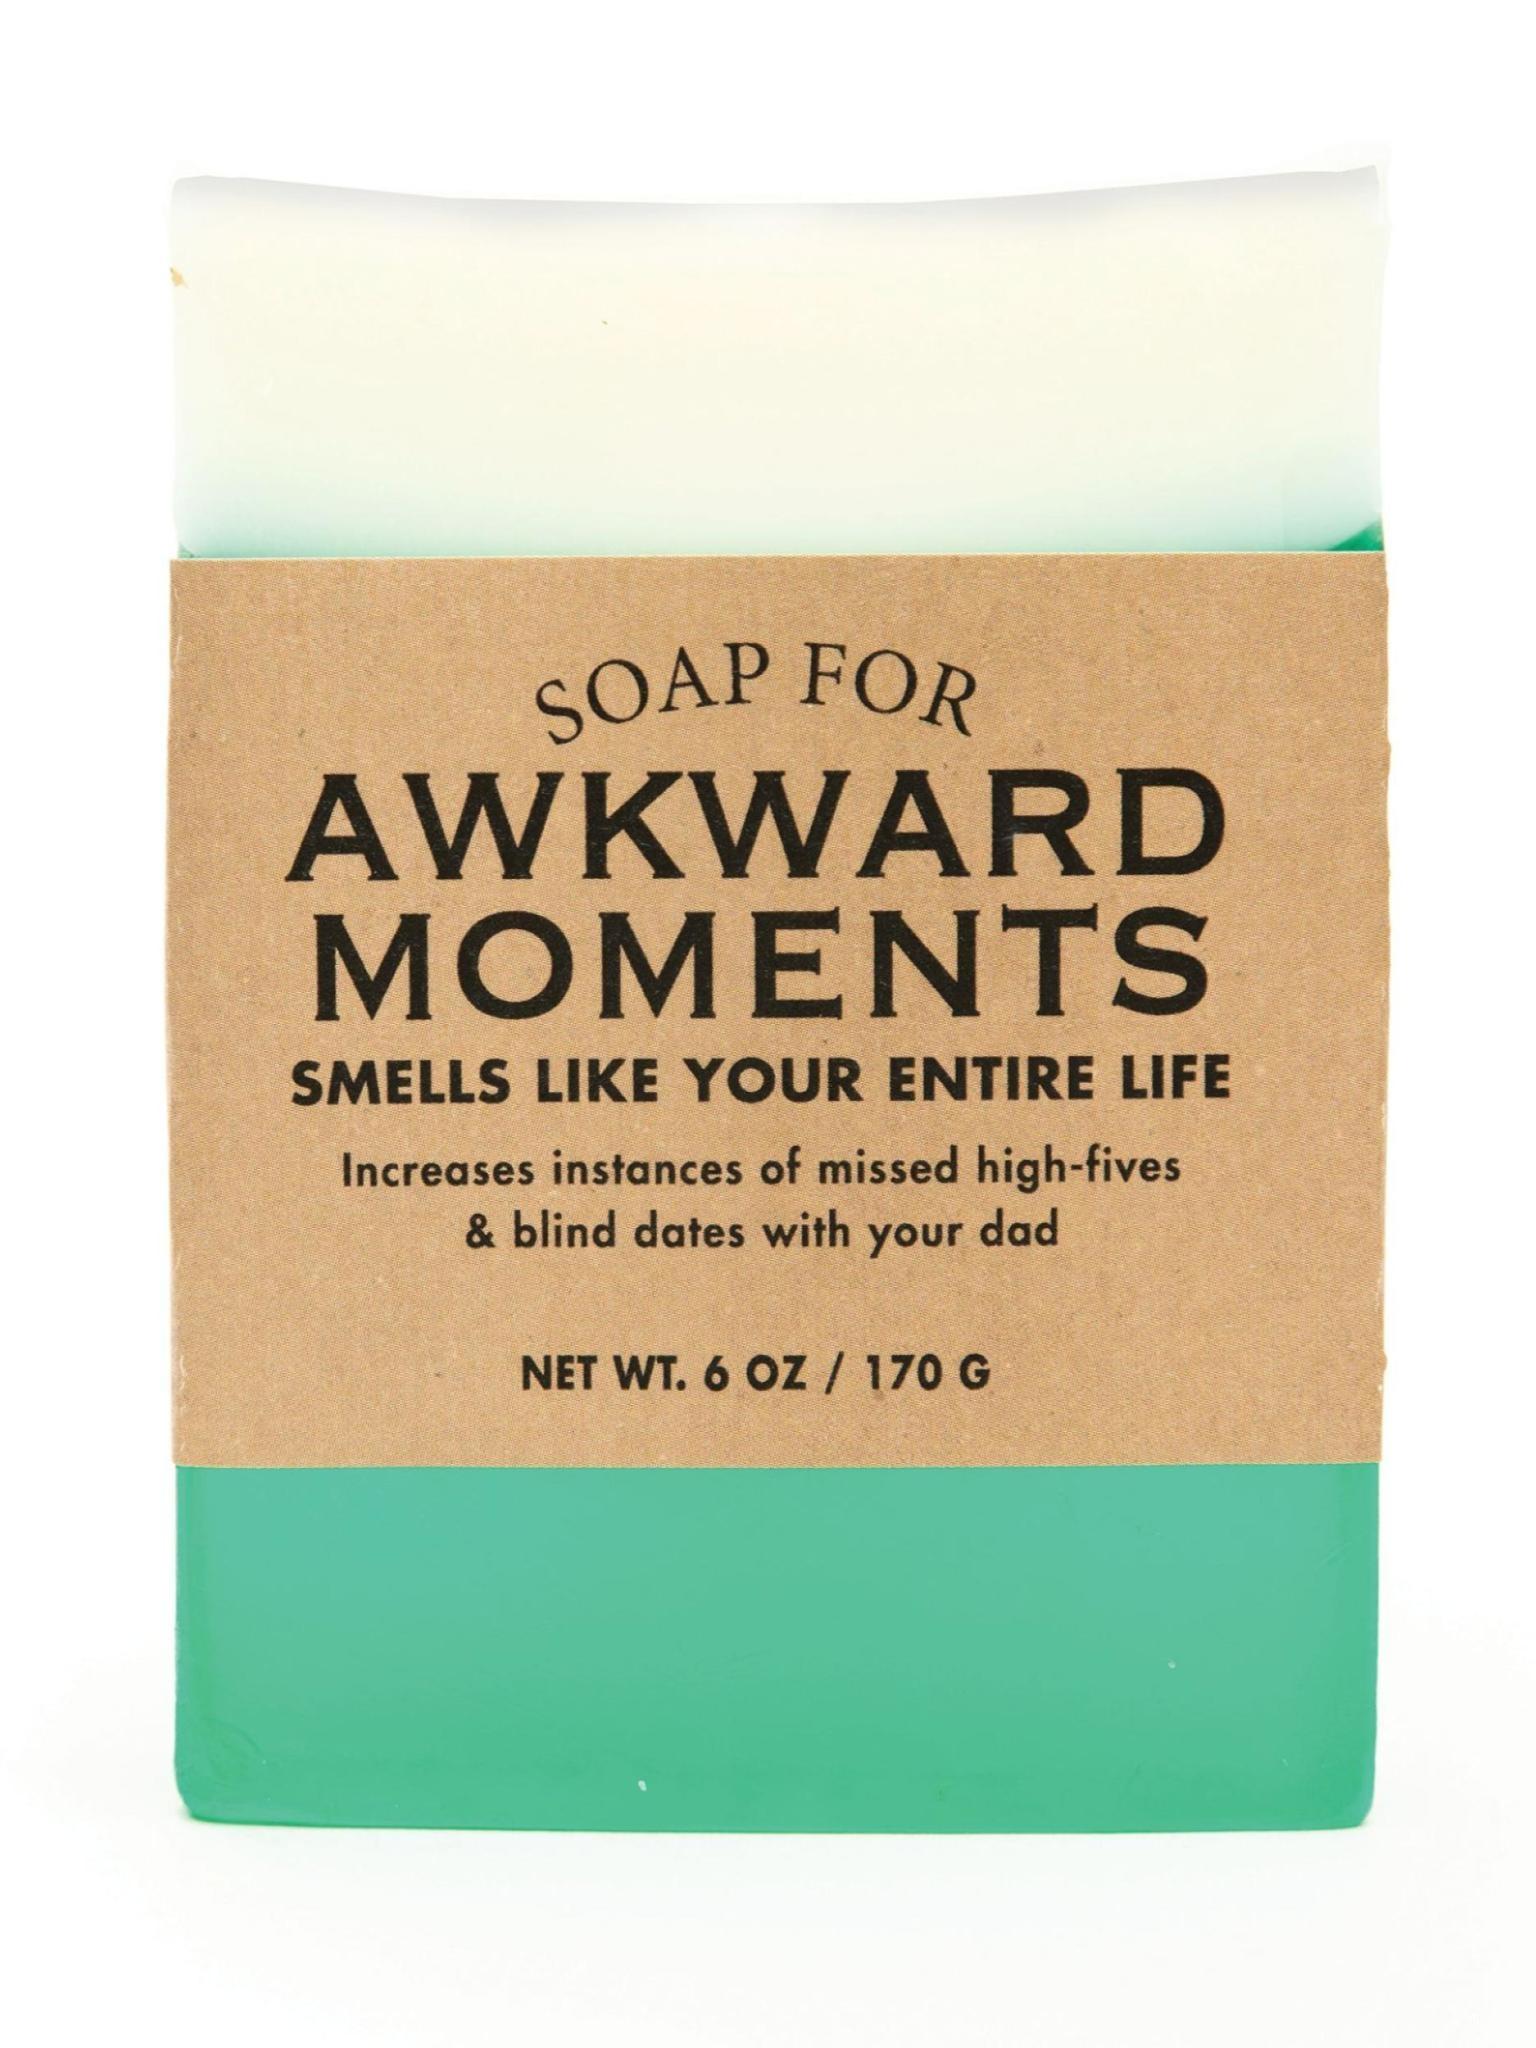 Whiskey River Soap Co. Awkward Moments Soap 6 oz